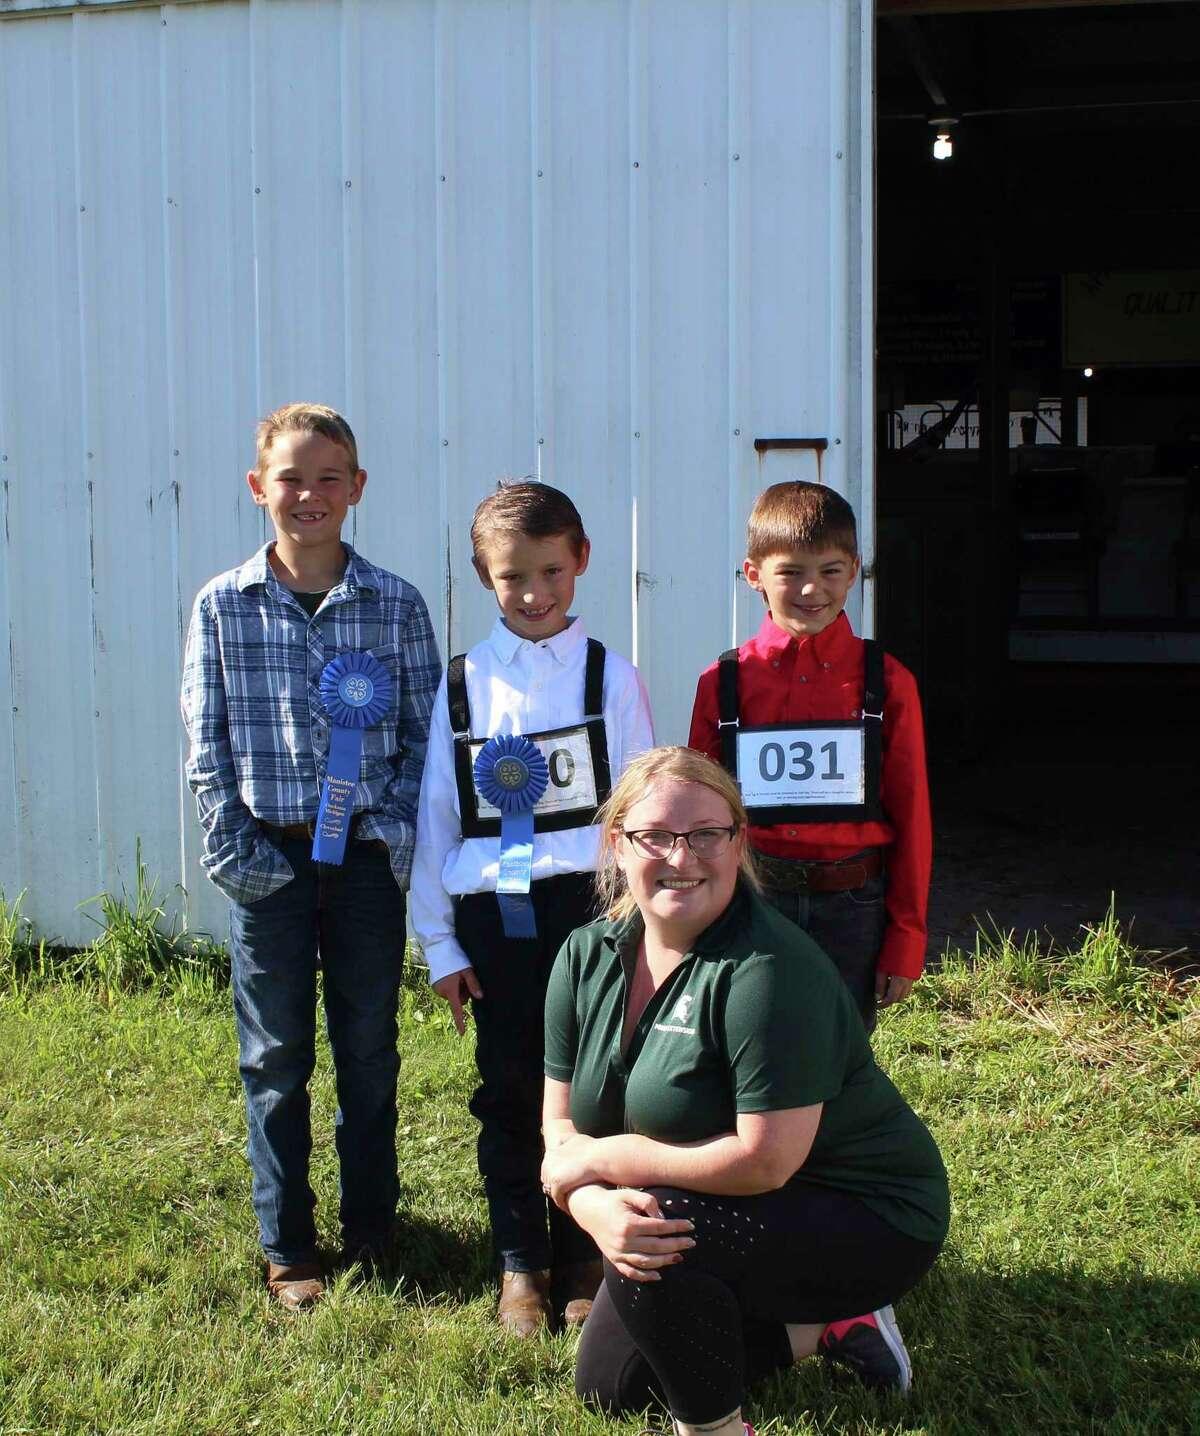 Lane Bradford, Kason Lambert, Sam Burrus and 4-H coordinator Allison Olson at the Manistee County Fair.(Kate Goodman/News Advocate)